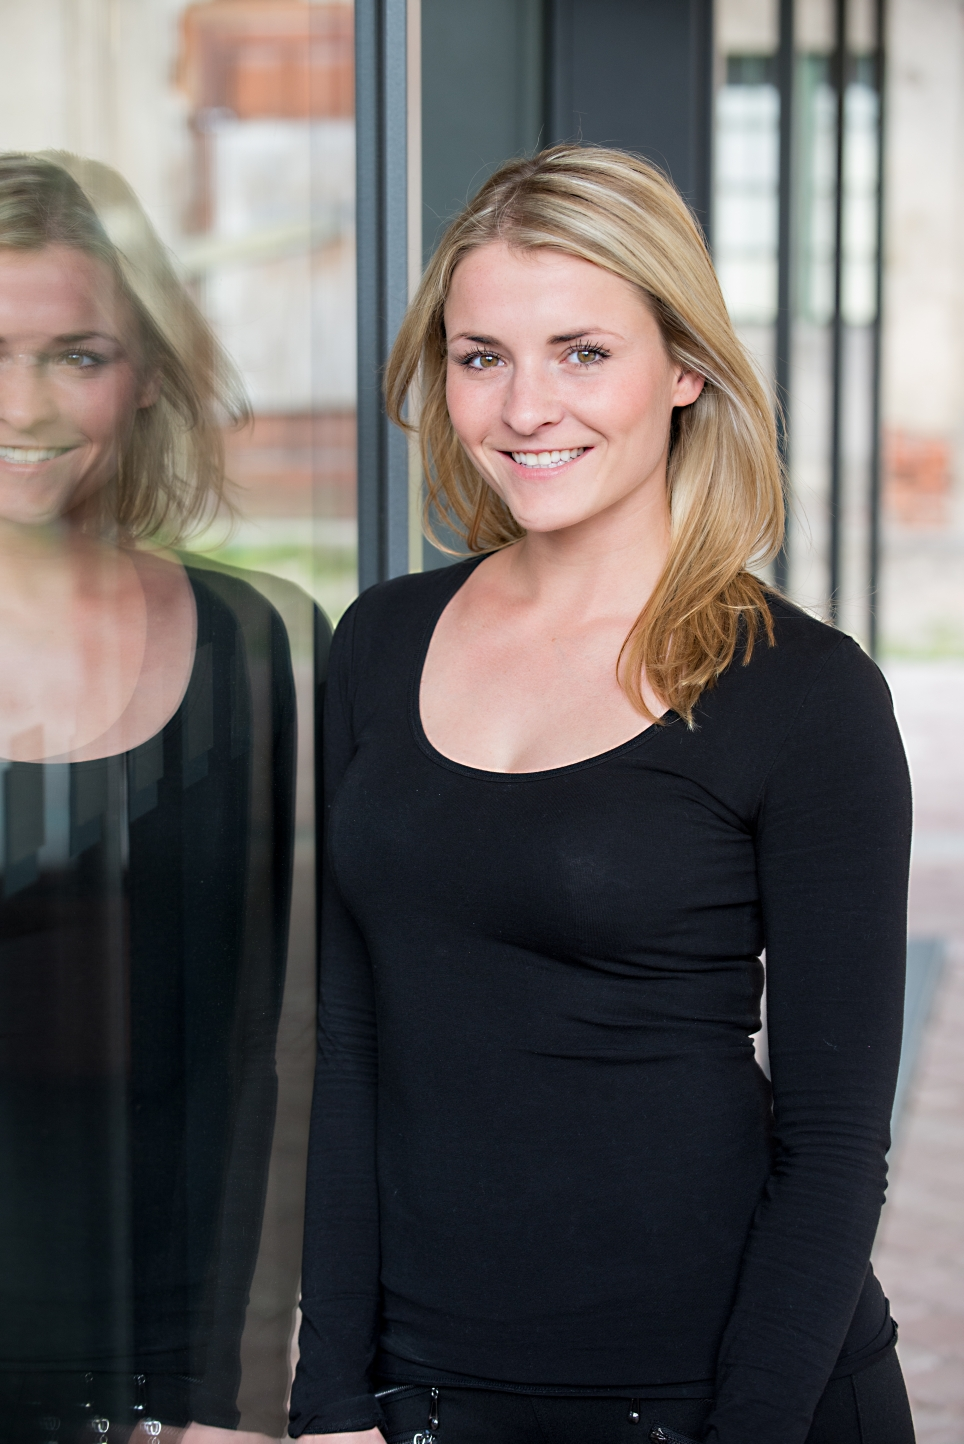 Stephanie Kausch #2